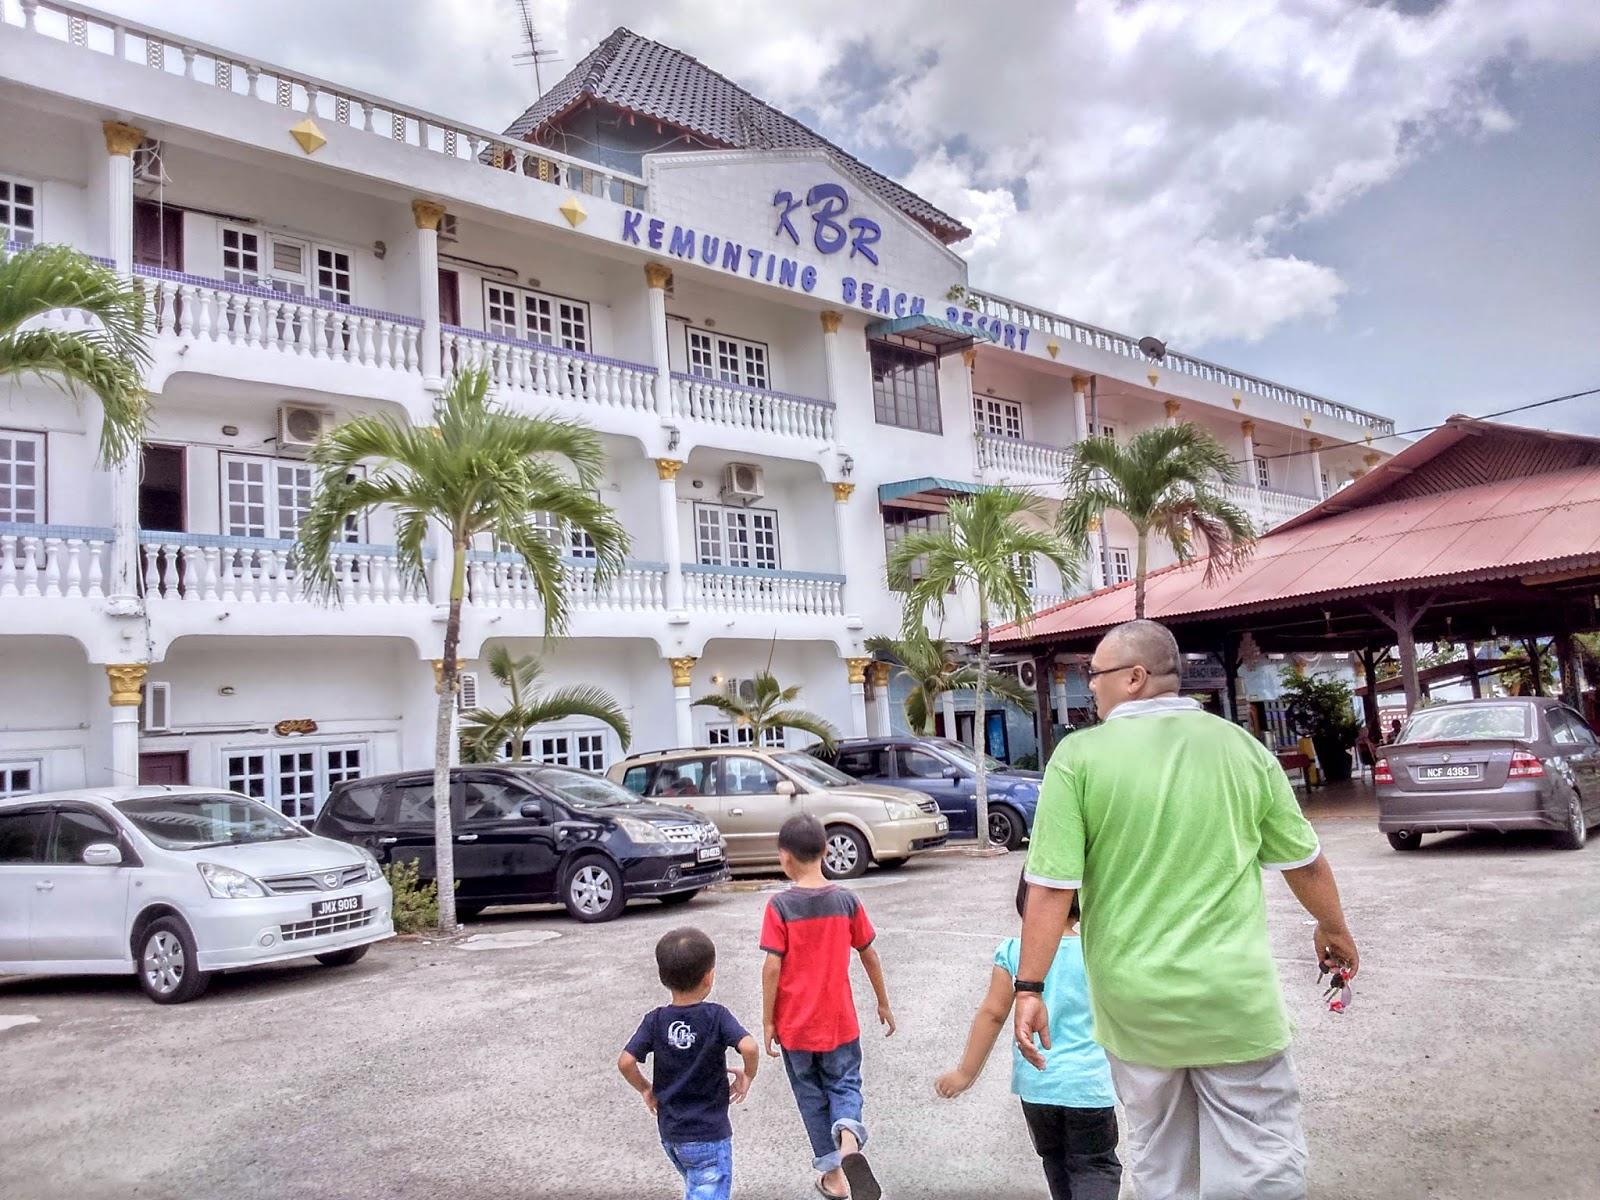 Okes Kitorang Stay 1 Malam Kat Kemunting Beach Resort Niok La Hotelnyanot Badcondition Masih Okbiasalah Hotel 3 Star Kanyang Bestnya Ada